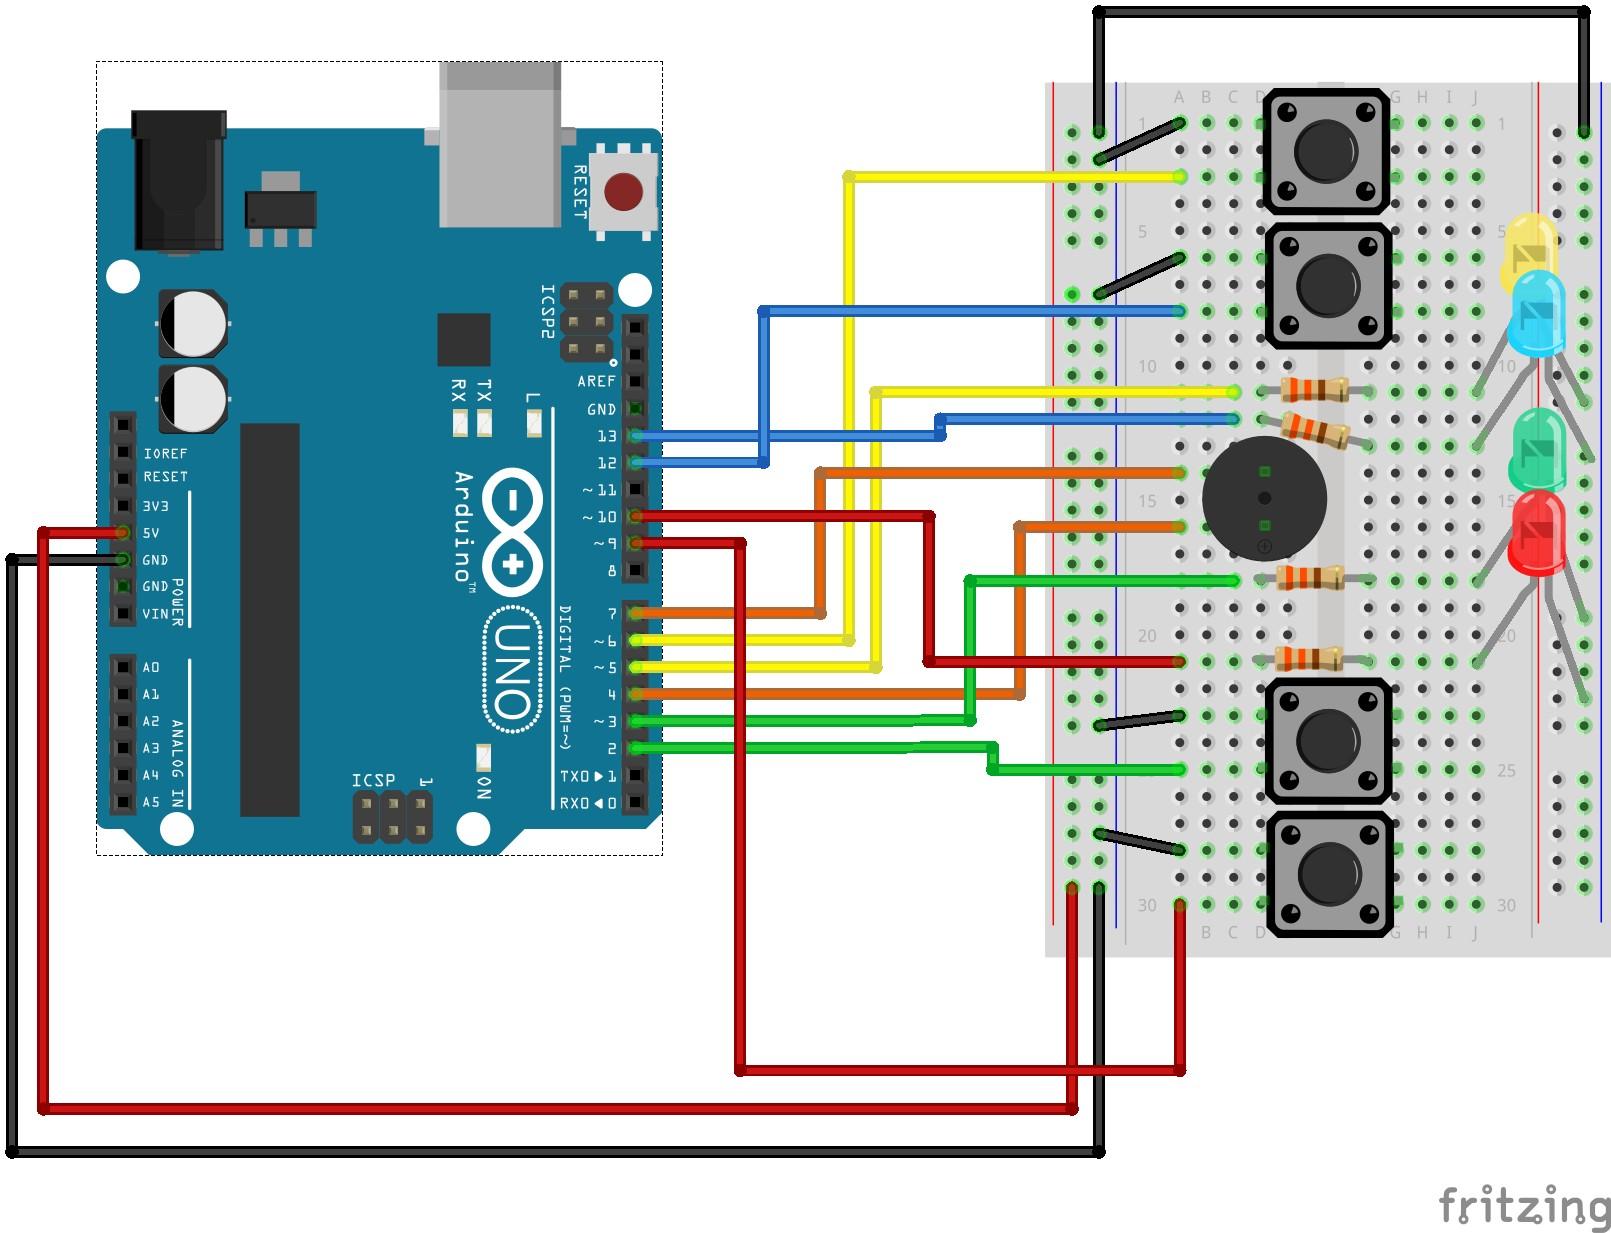 Arduino Wiring Schemtic Maker Arduino Simon Says Arduino Project Hub Of Arduino Wiring Schemtic Maker